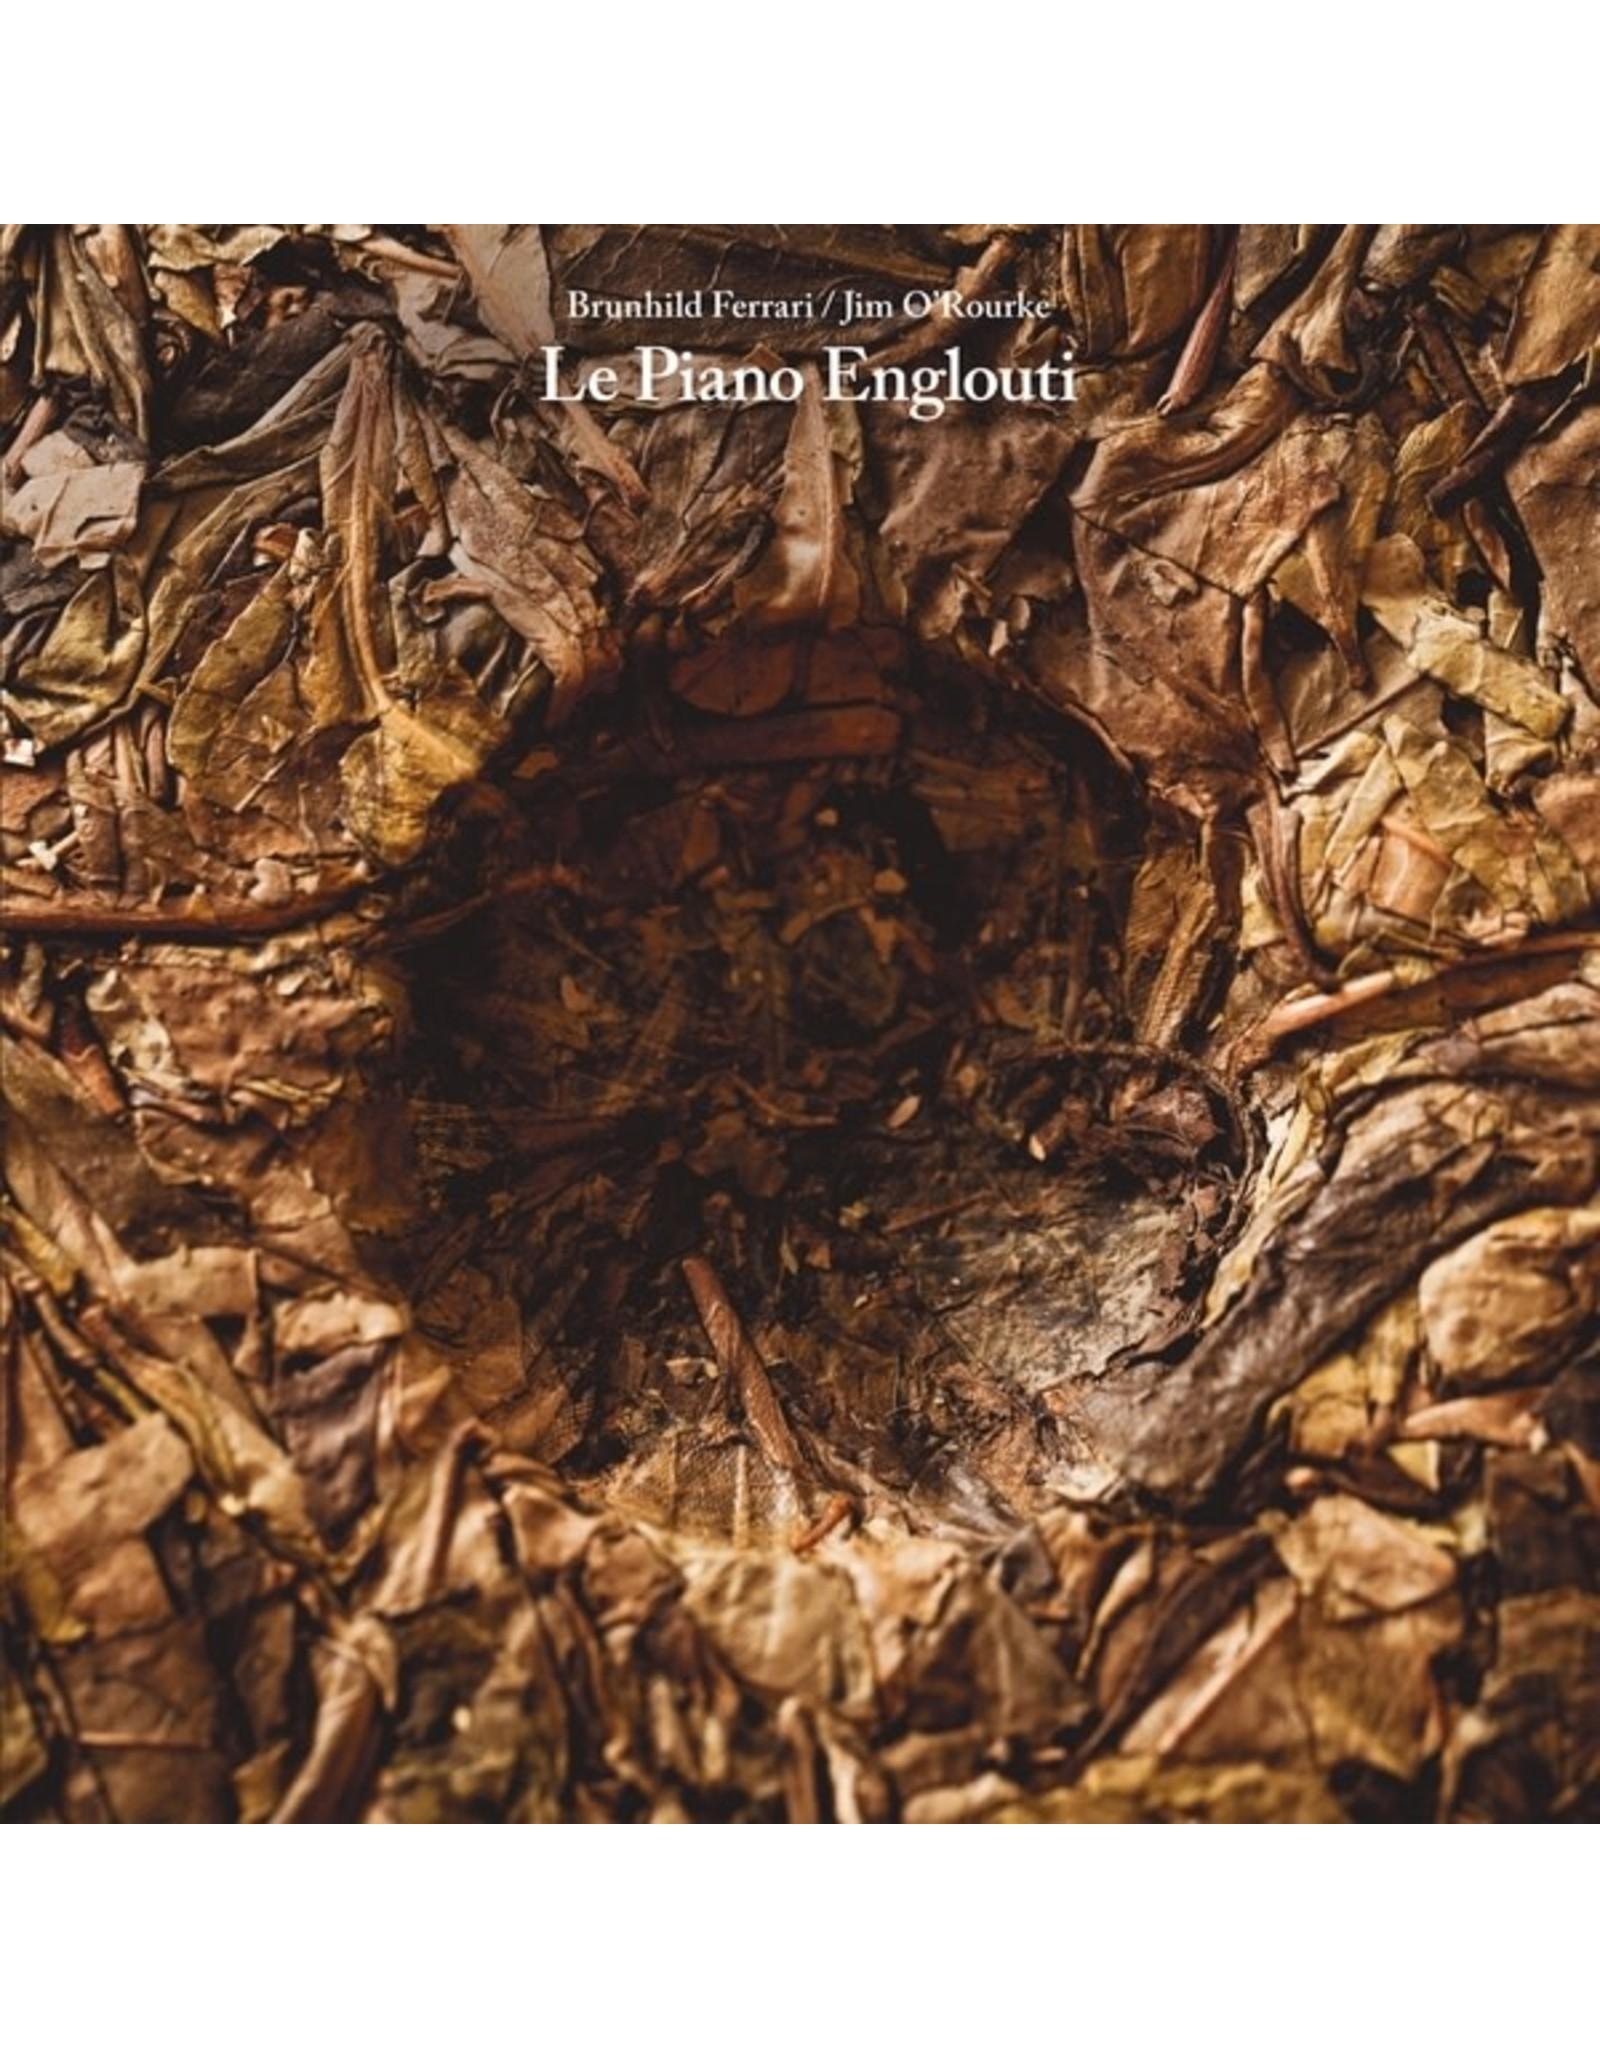 Black Truffle Ferrari, Brunhild & Jim O'Rourke: Le Piano Englout LP